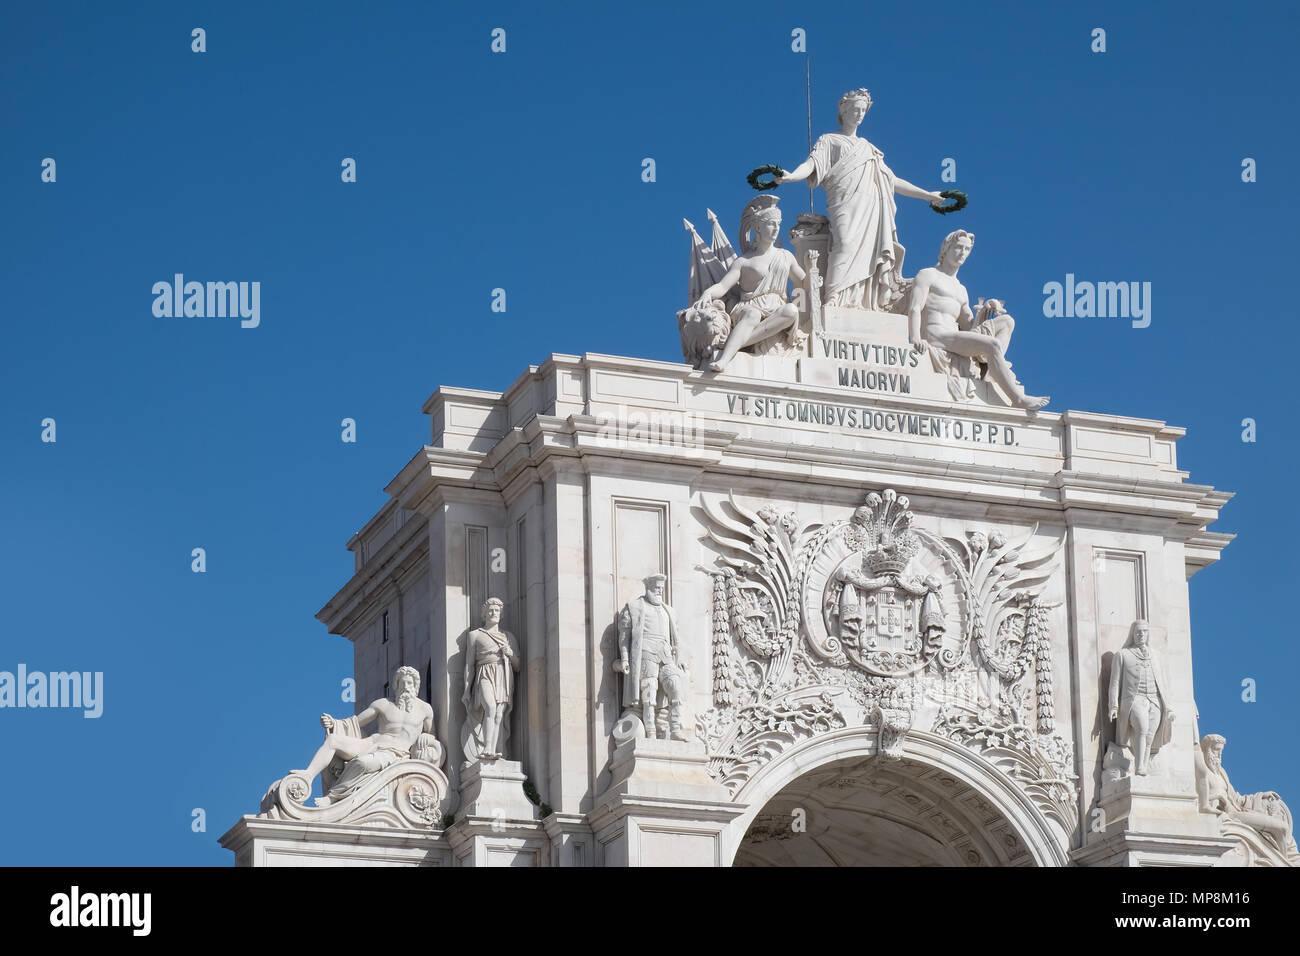 Rua Augusta Arch, Lisbon. The arch overlooks the Praca do Comercio - Stock Image